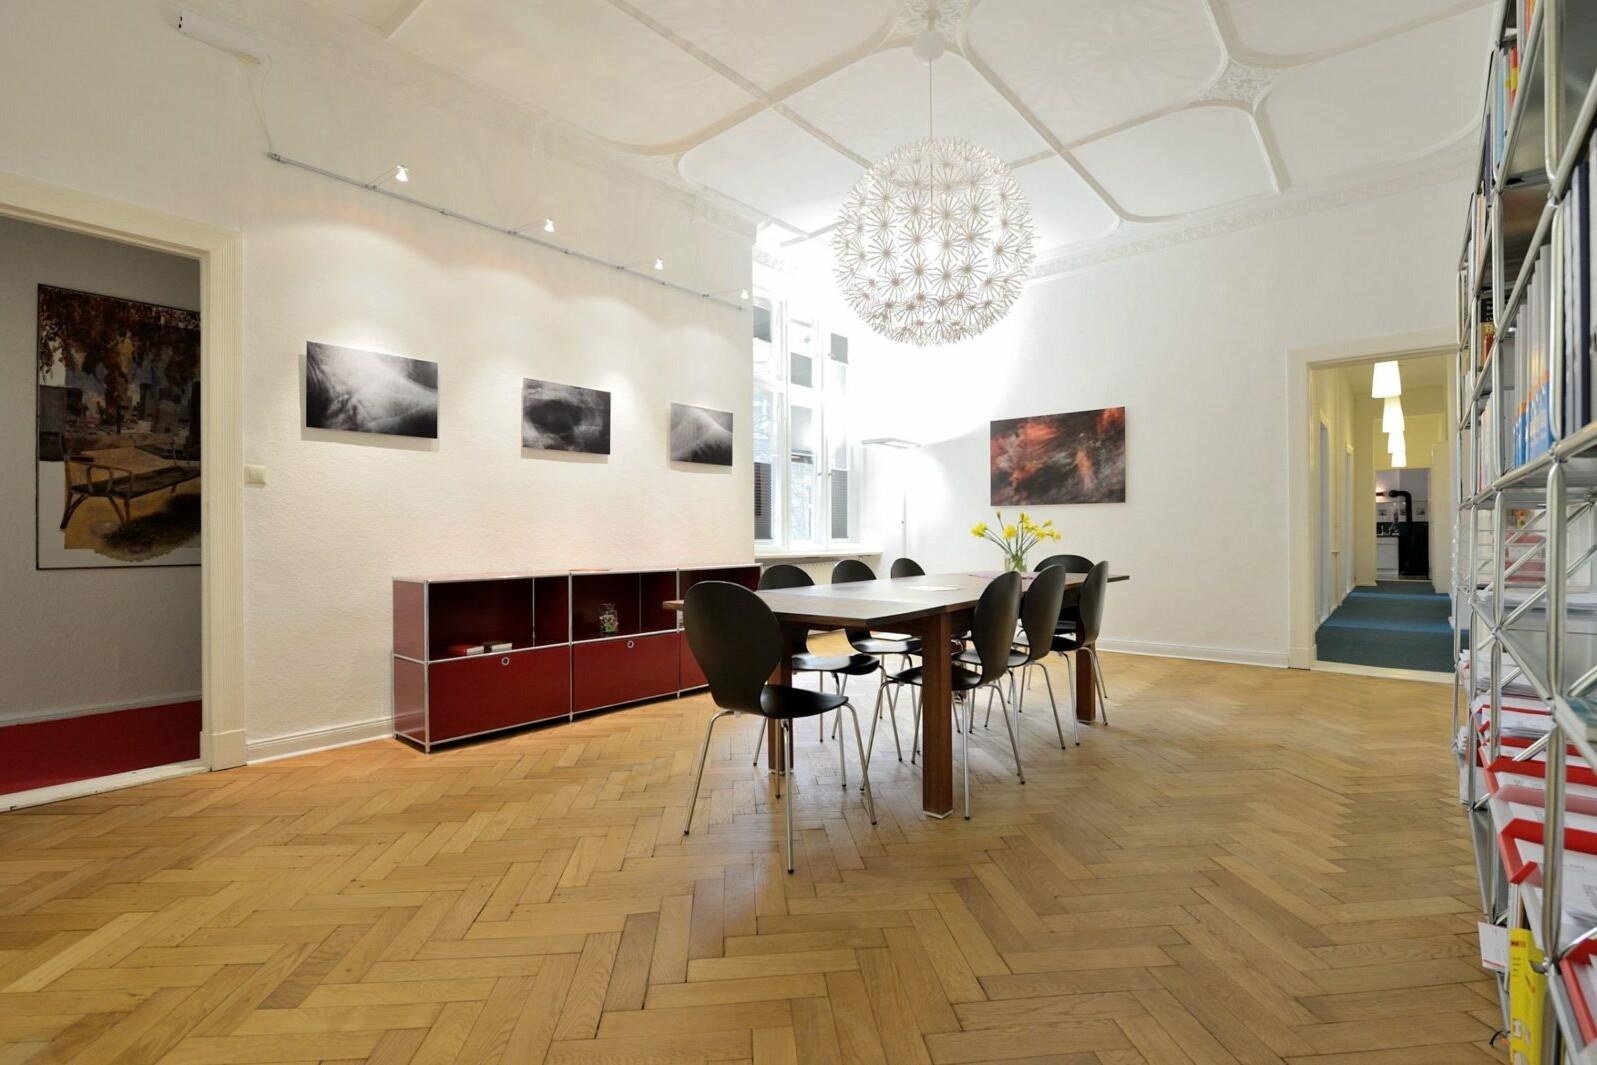 Büro_Eberl-Pacan_Wilmersdorf_Foto_Andreas Franke - panabild_de